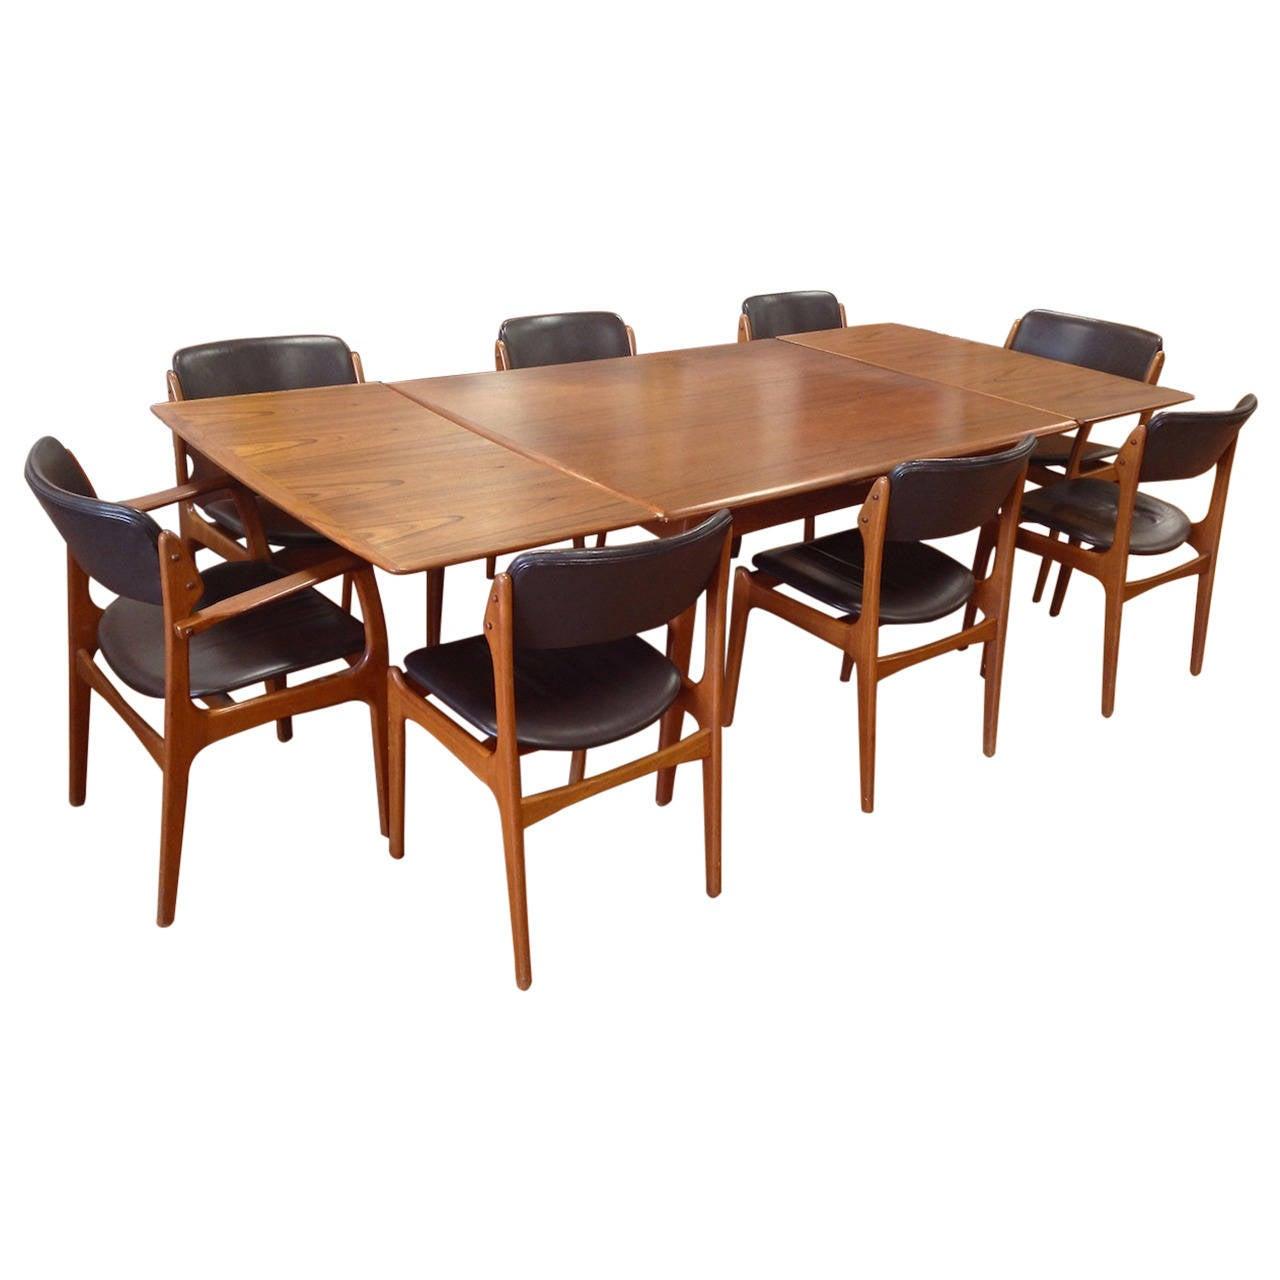 Danish modern teak dining table by svend madsen with eight erik buck chairs at 1stdibs - Scandinavian teak dining room furniture design ...